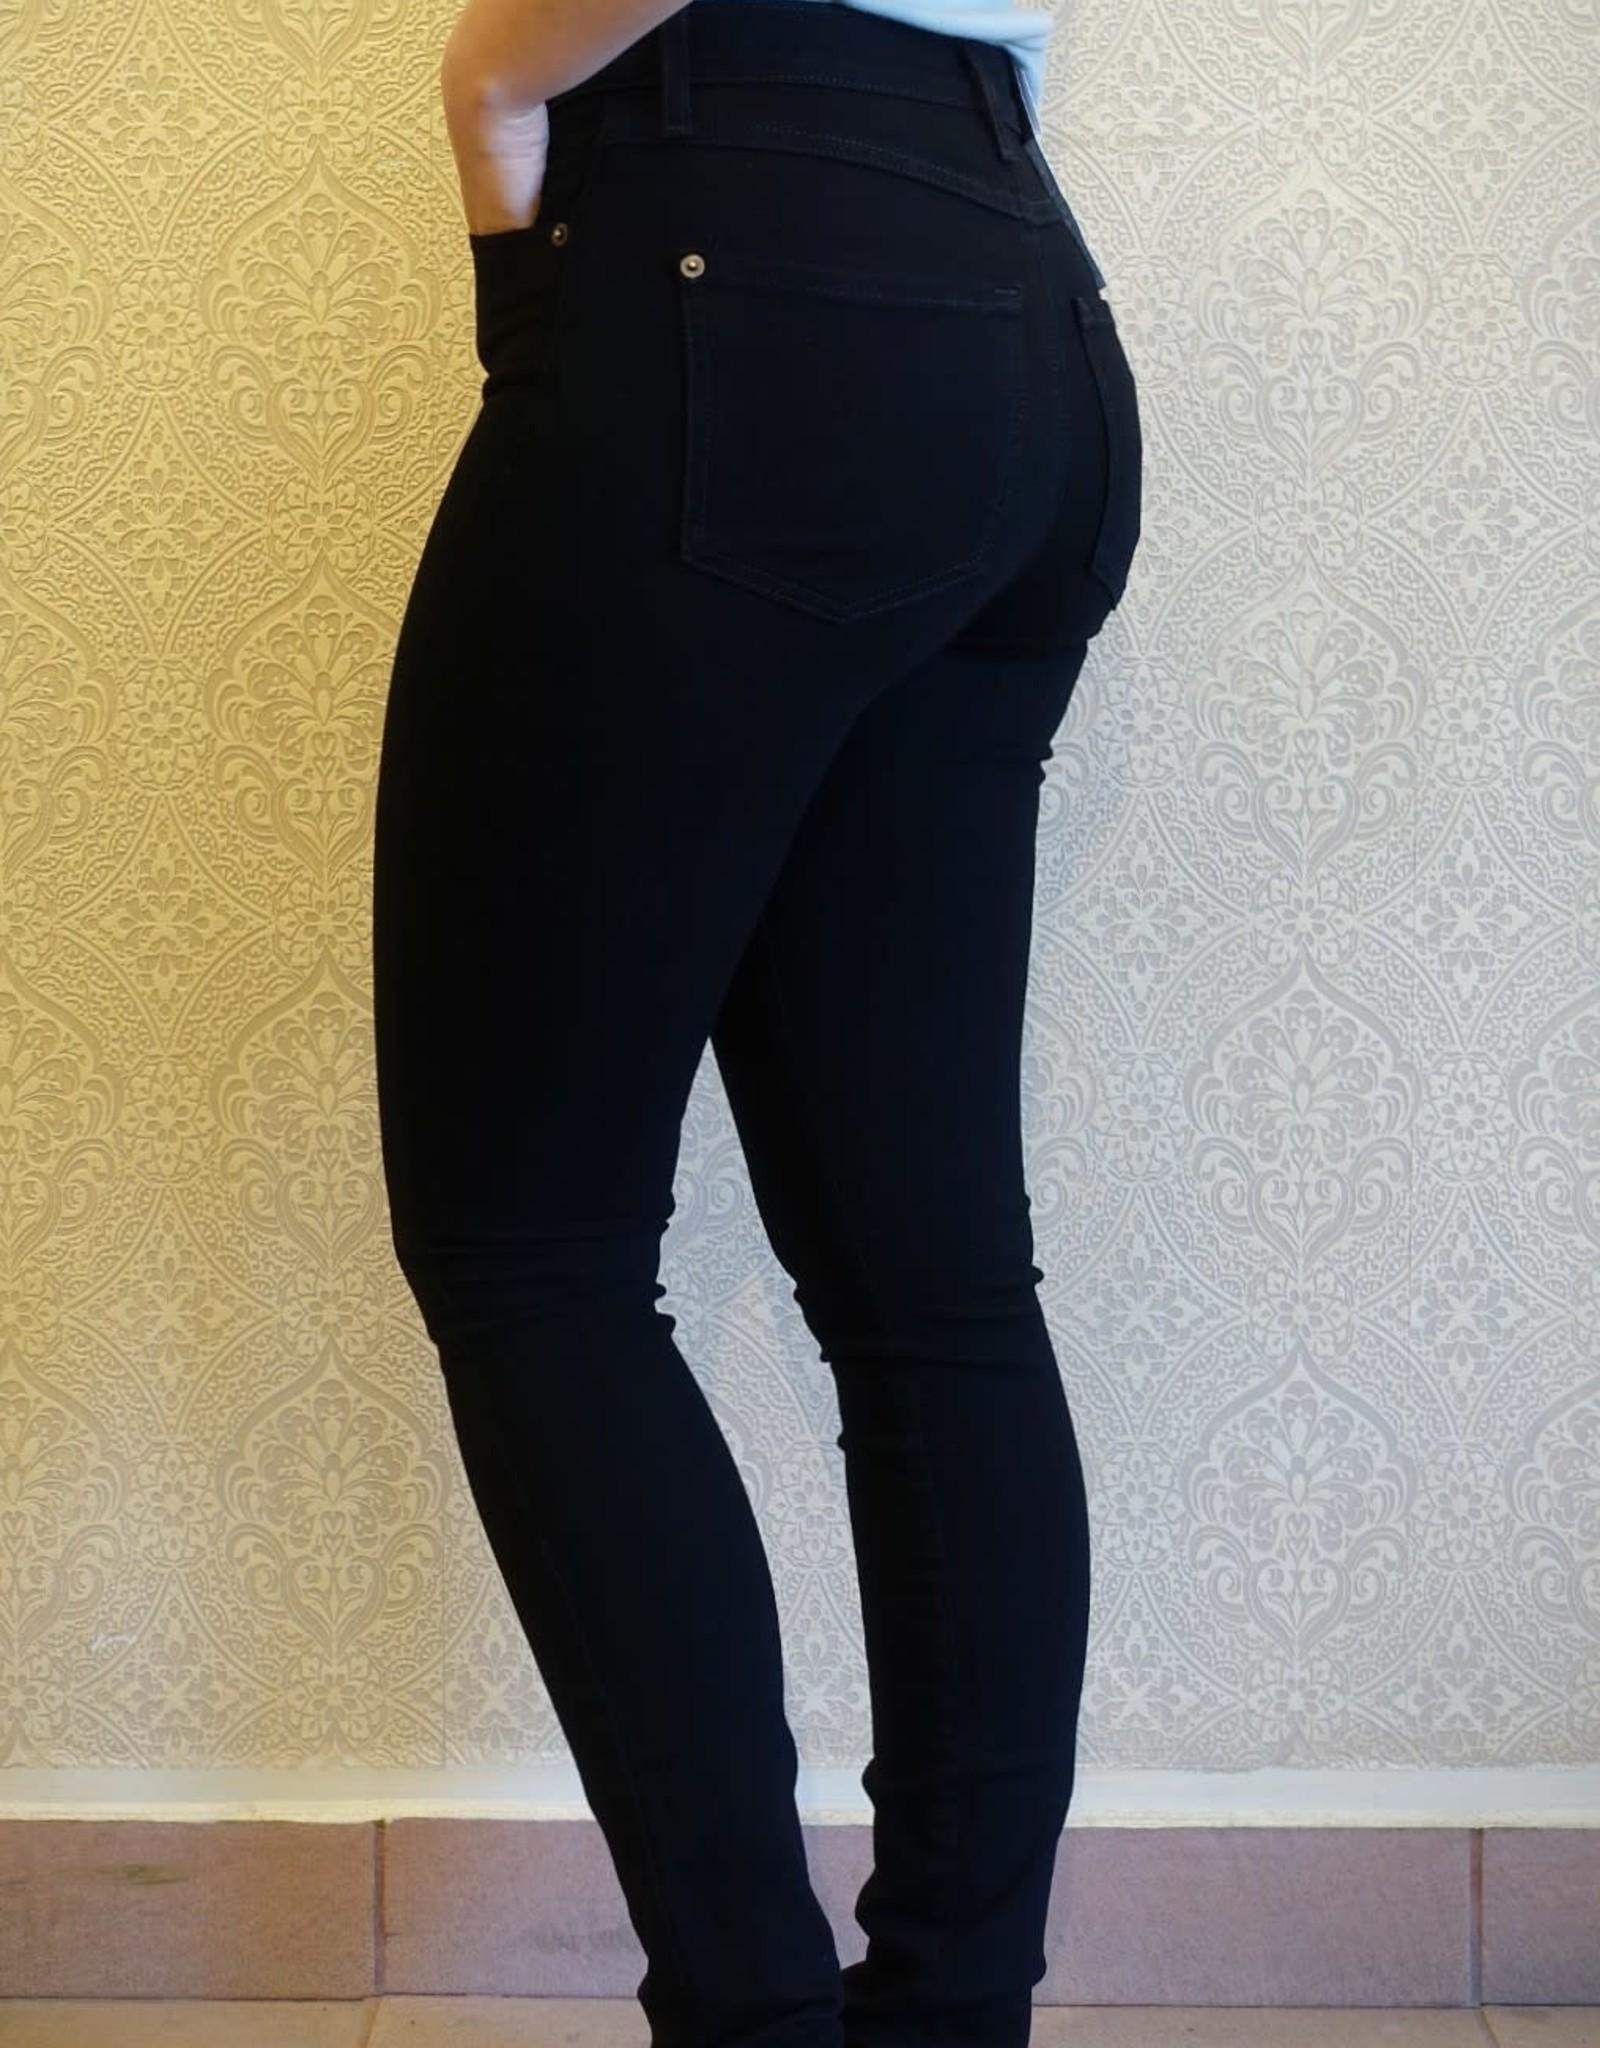 Yoga Jeans High Rise Skinny Rachel 1963 Yoga Jeans